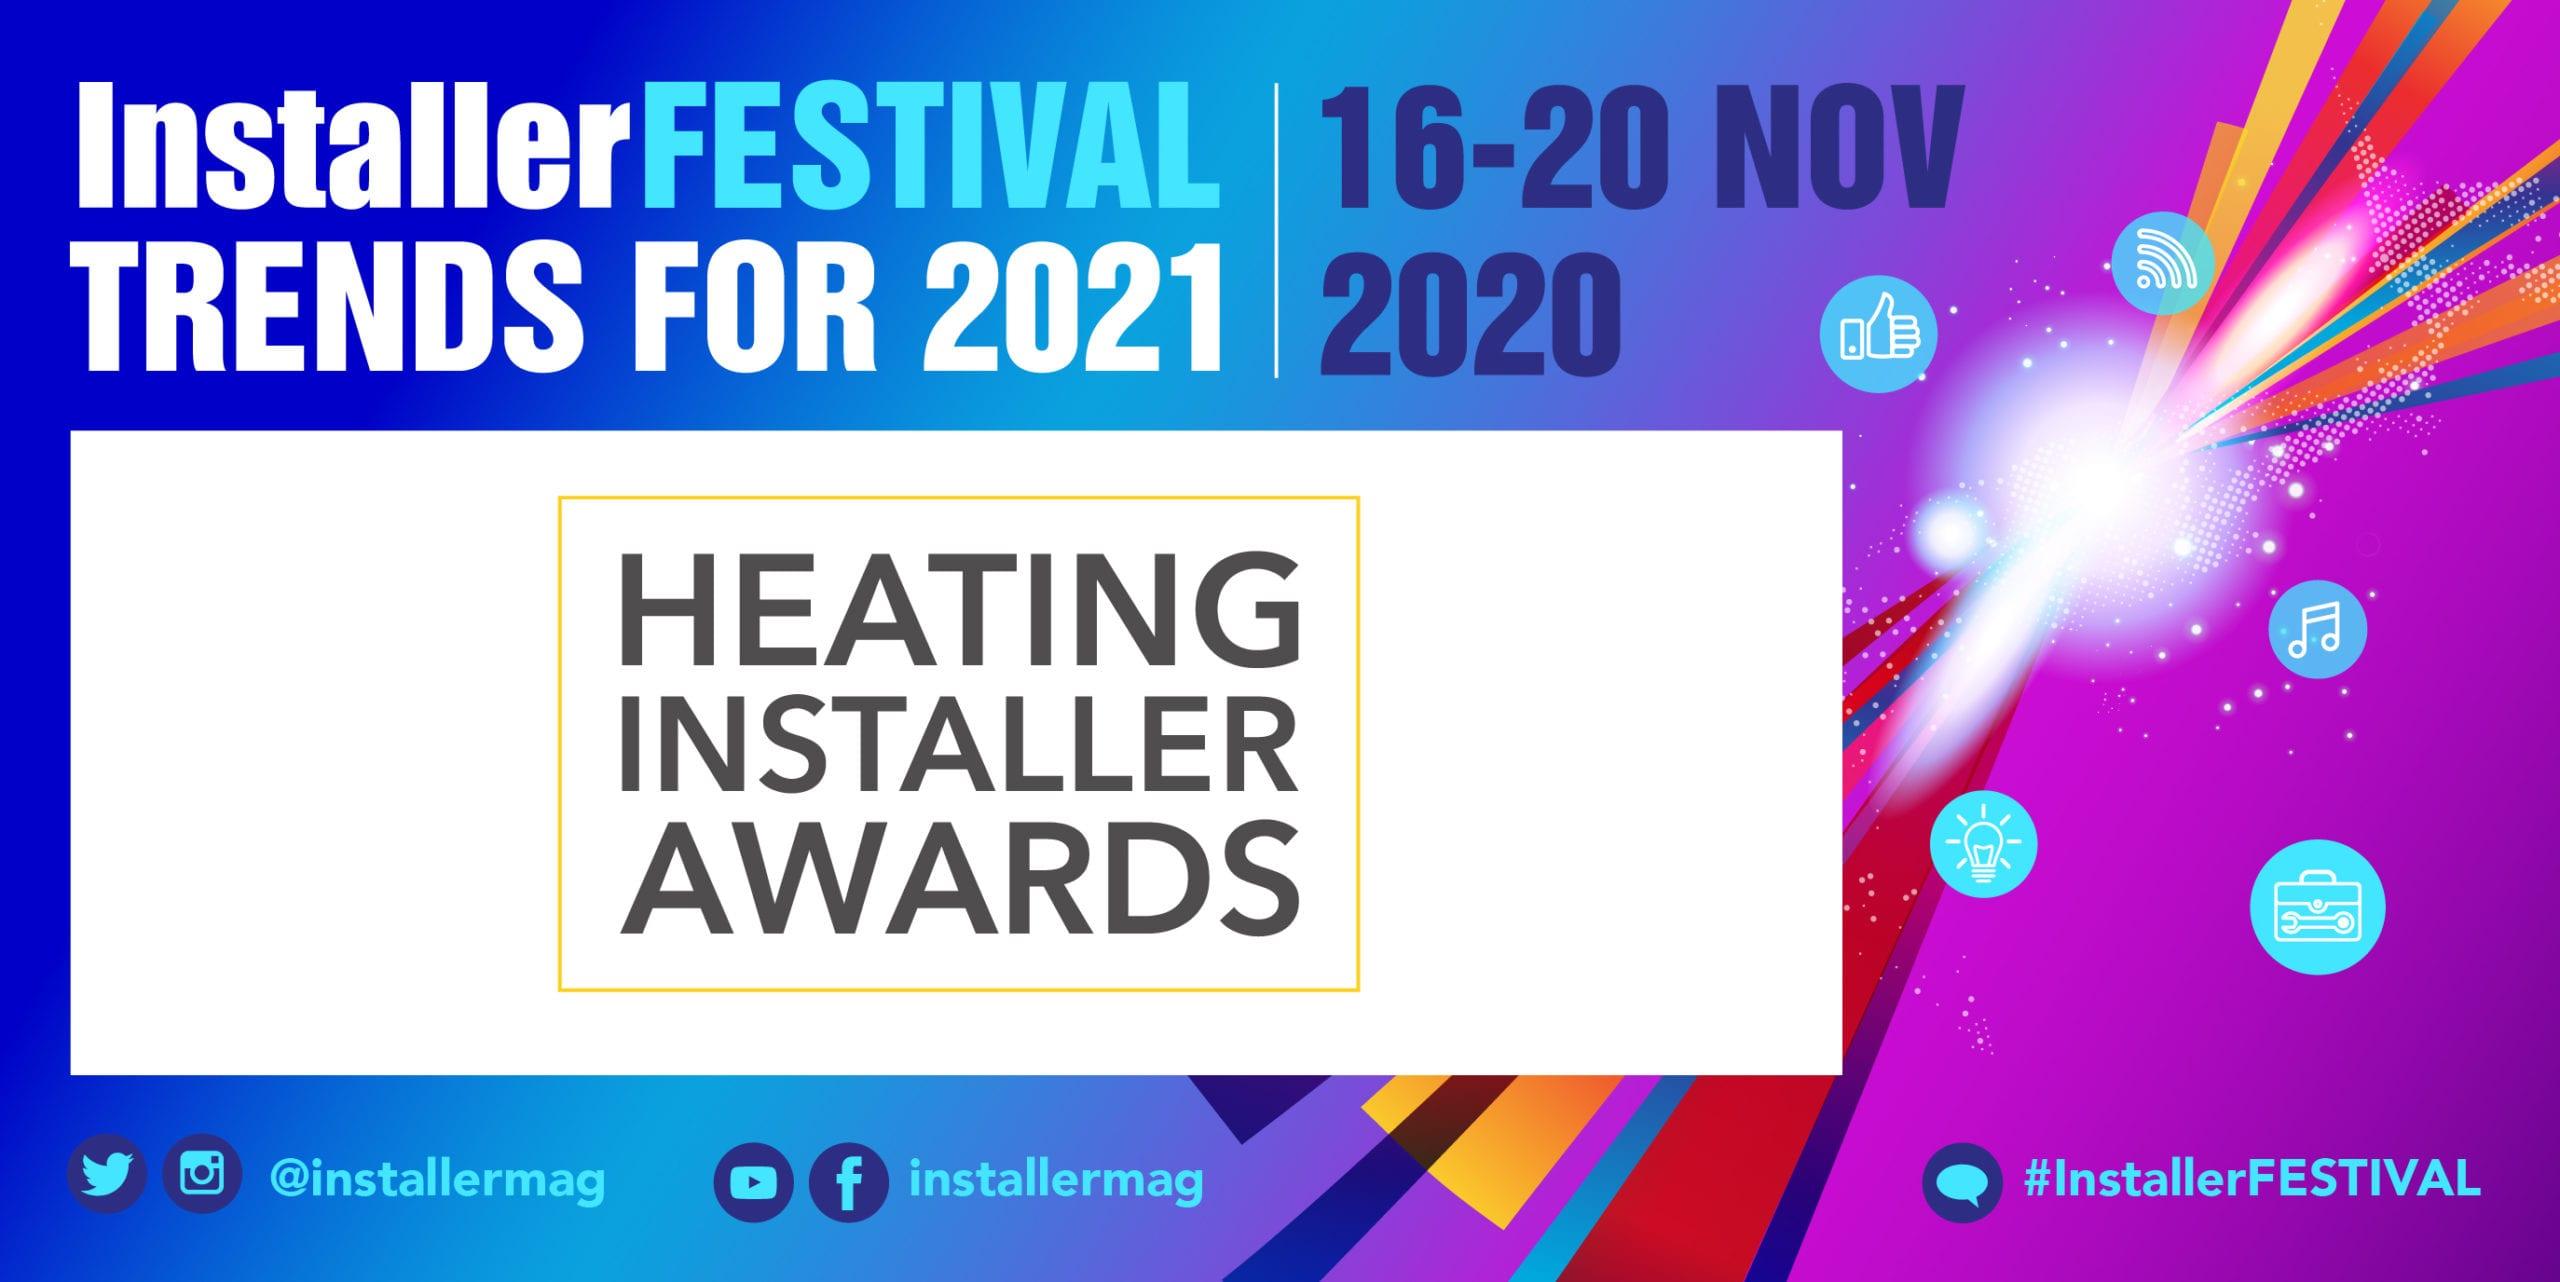 Popular - Installer catches up with Heating Installer Awards 2020 winners for InstallerFESTIVAL